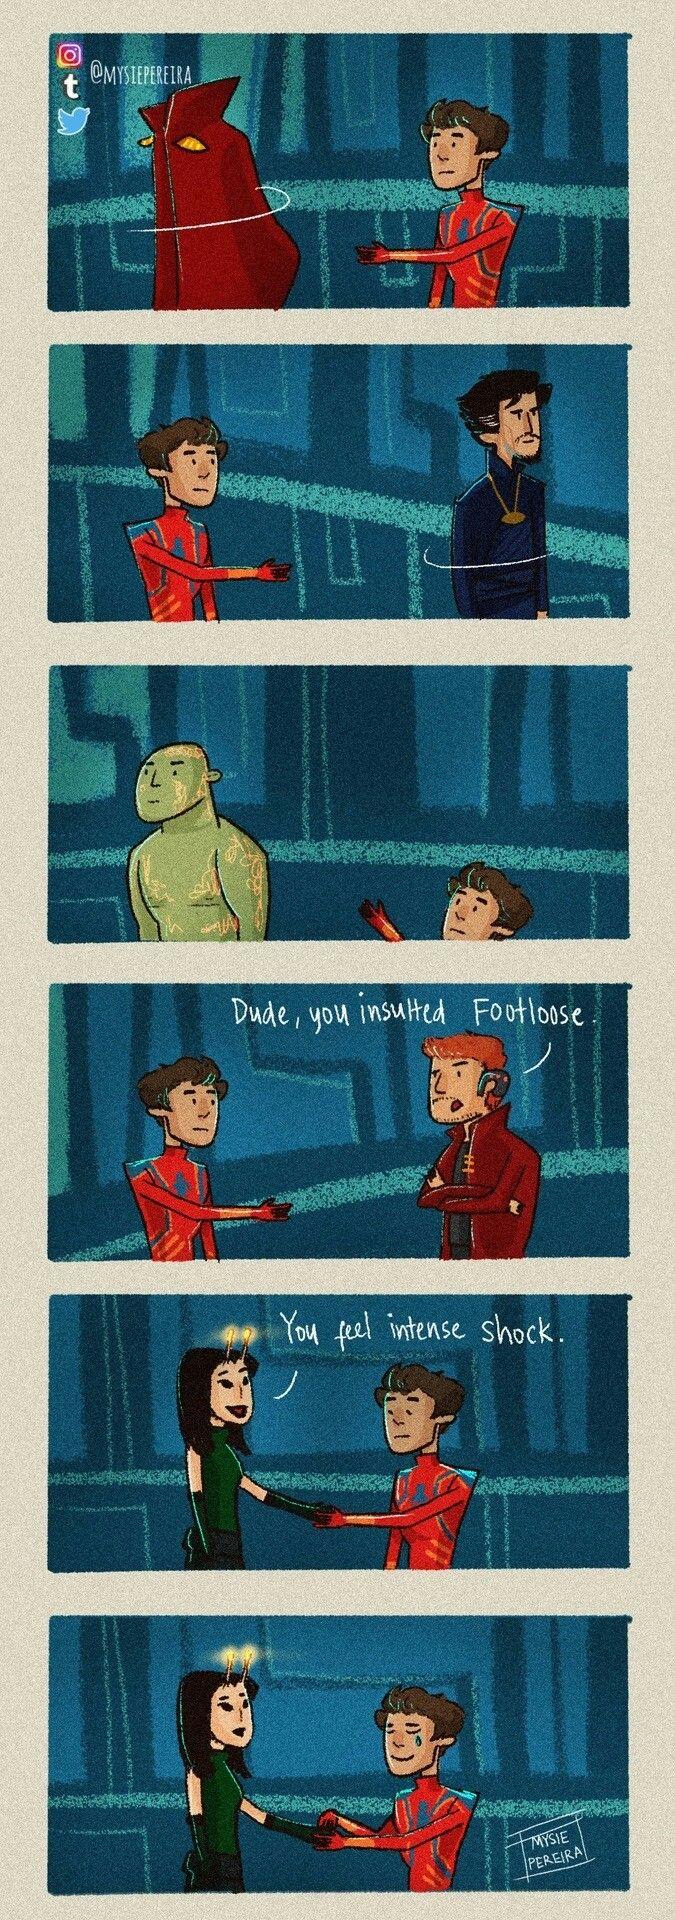 Peter Finally Gets That Handshake Avengers Infinity War Spiderman Mantis Drax Dr Strange Starlord Marvel Superheroes Marvel Jokes Marvel Funny